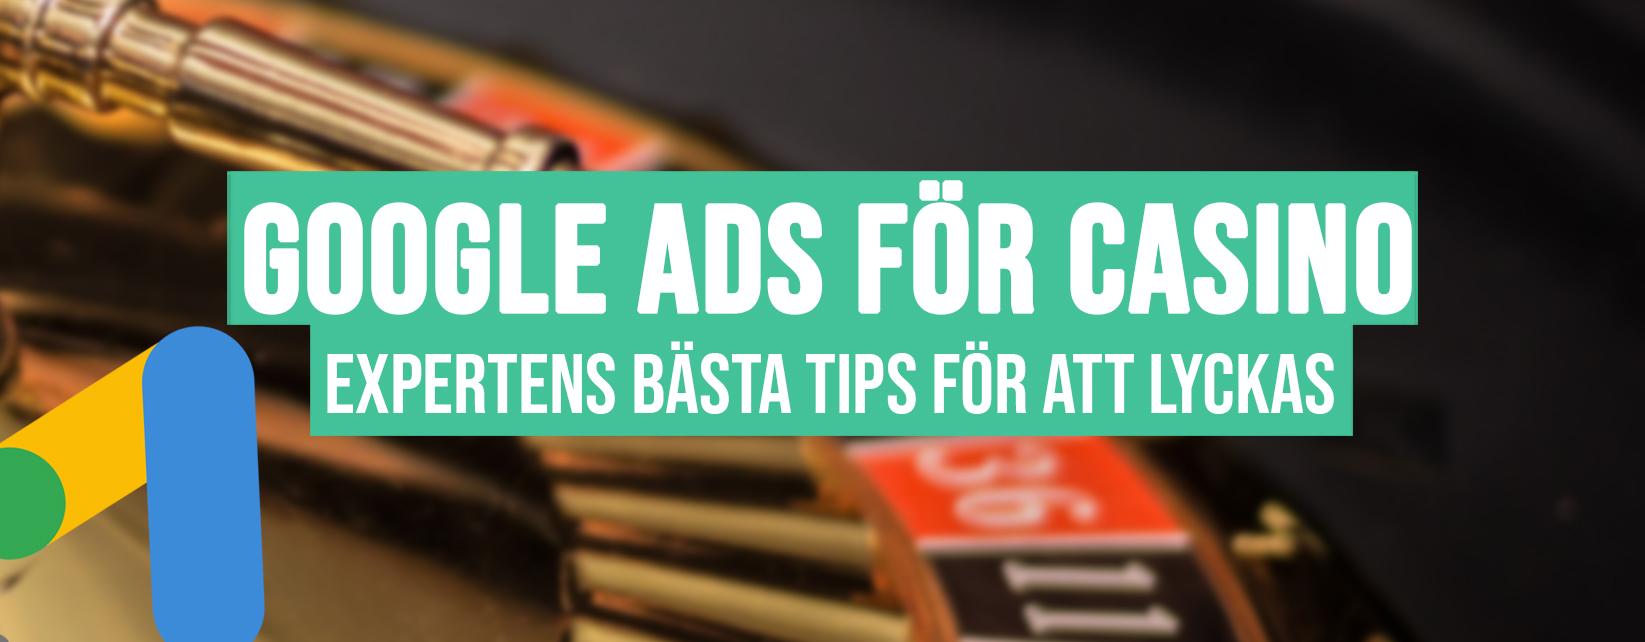 ads_casino_header2